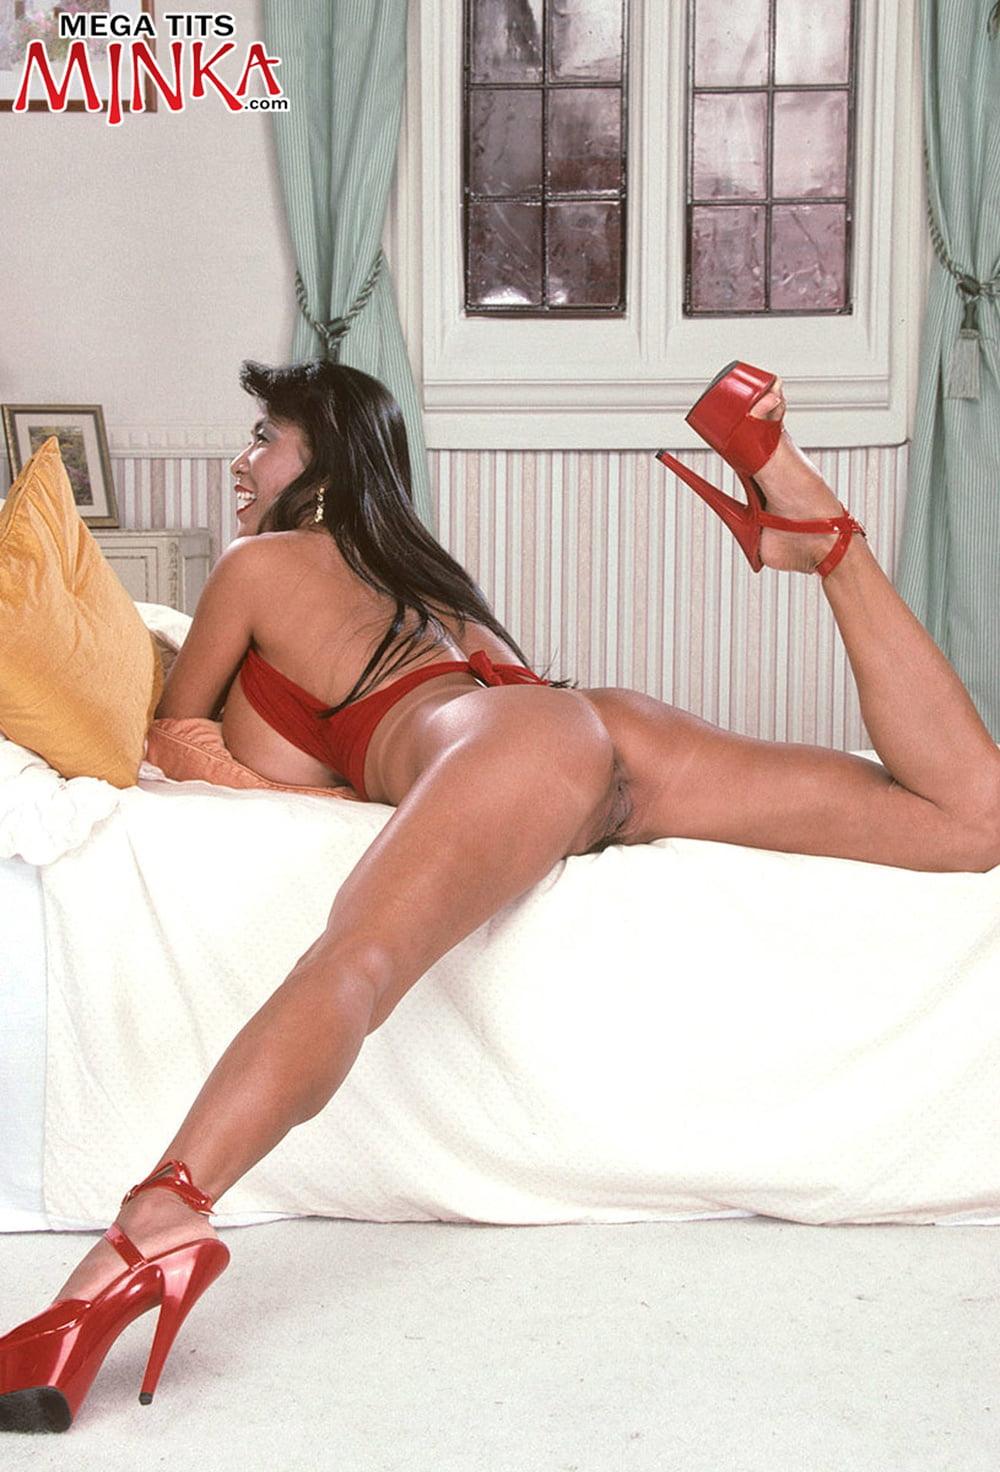 xxx pics Hot girl hard anal fucked fishnet